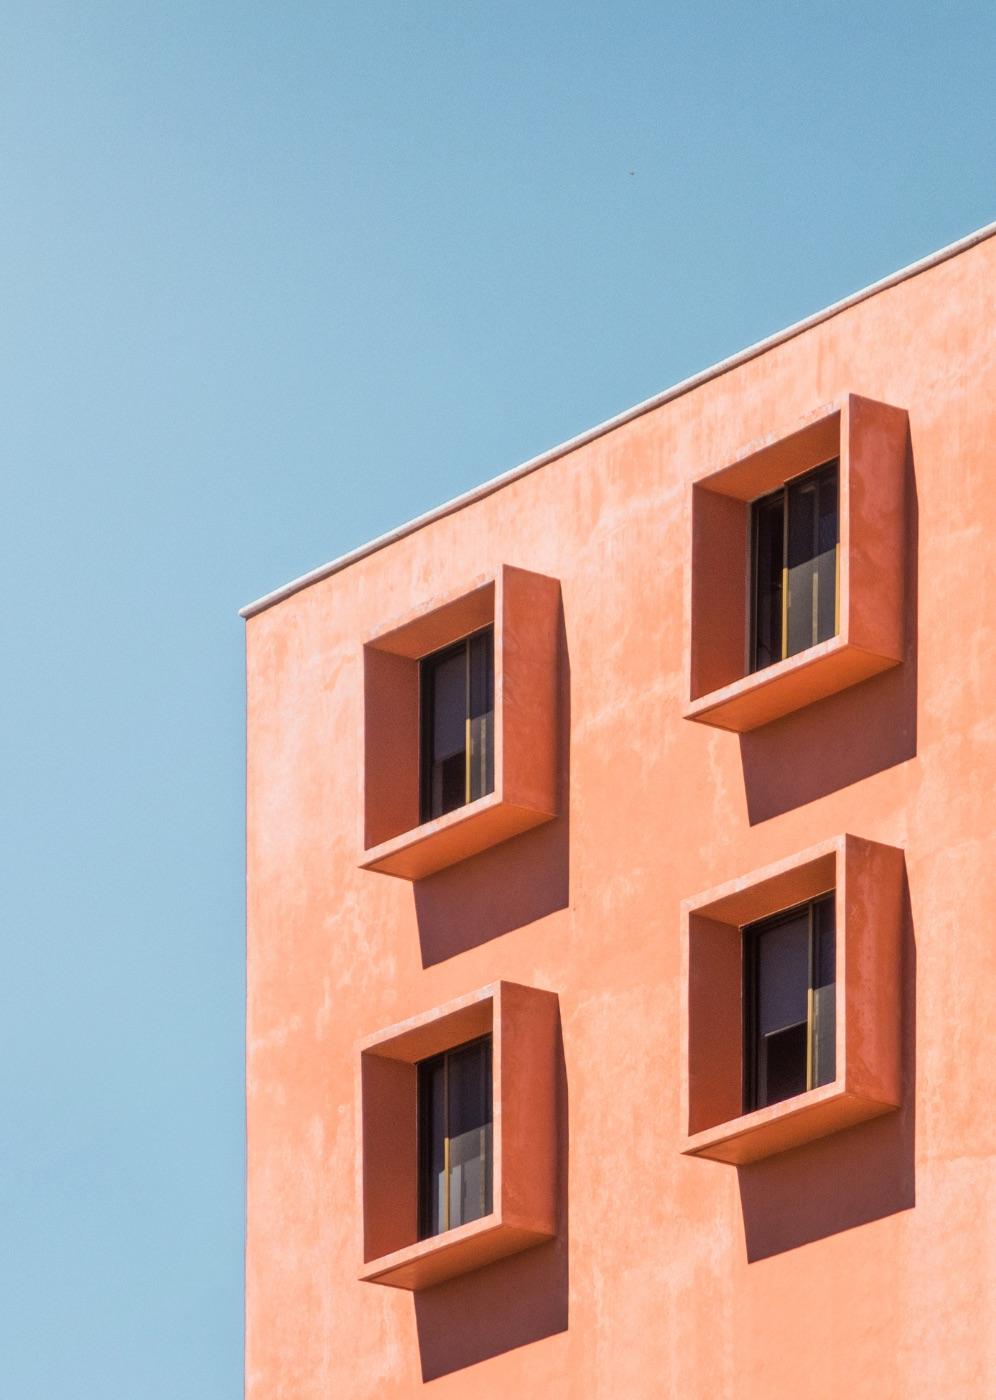 abstract light pink block of flats